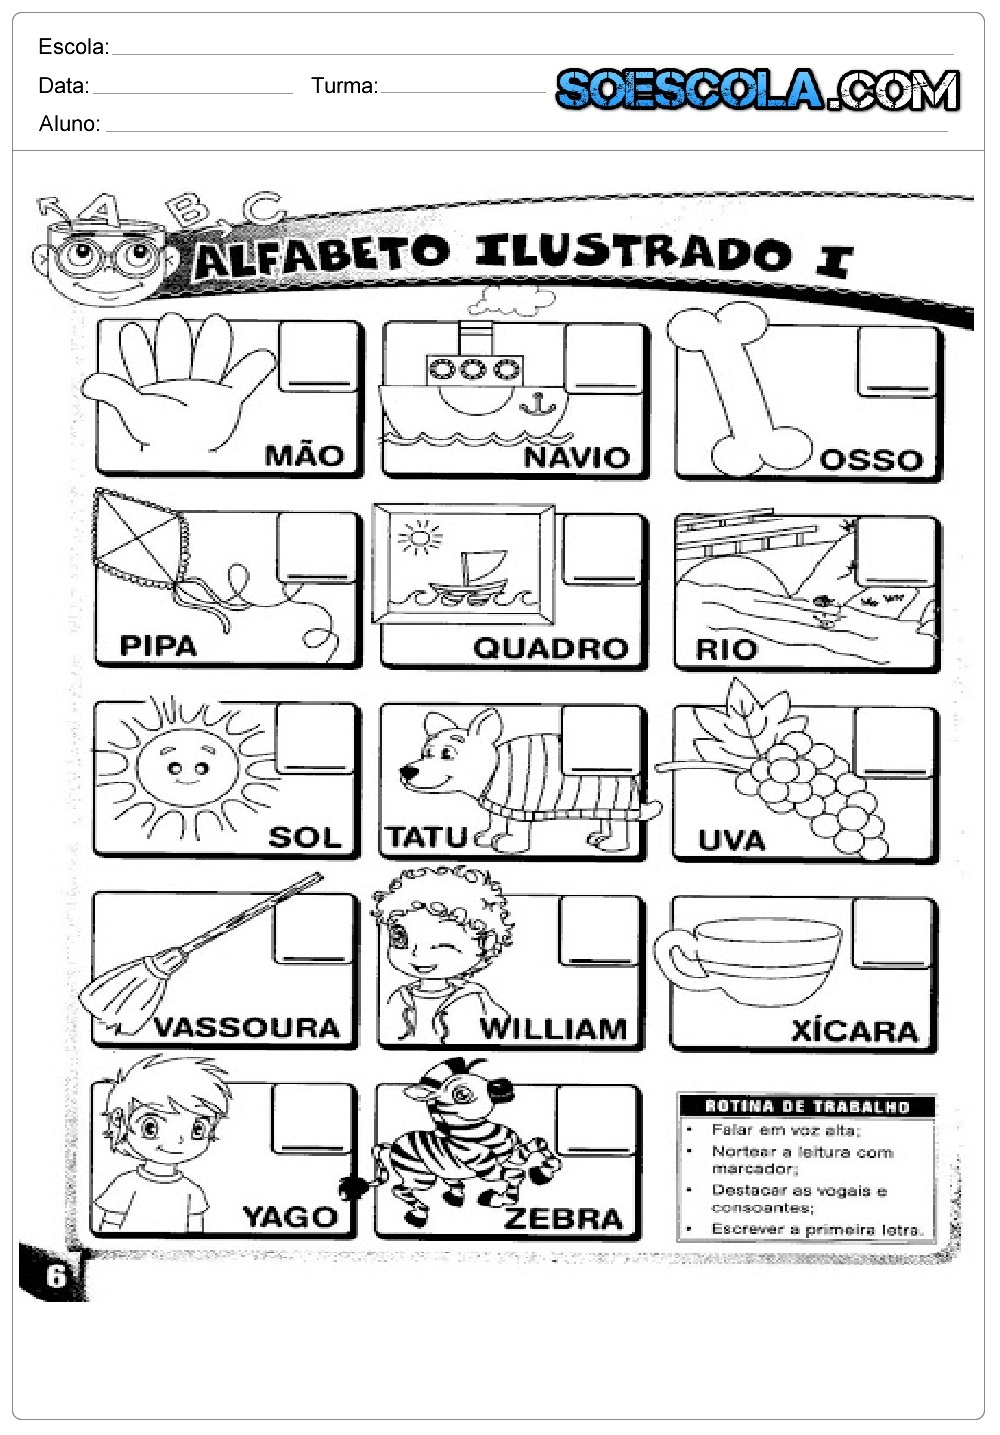 Atividades Educativas sobre Alfabeto ilustrado